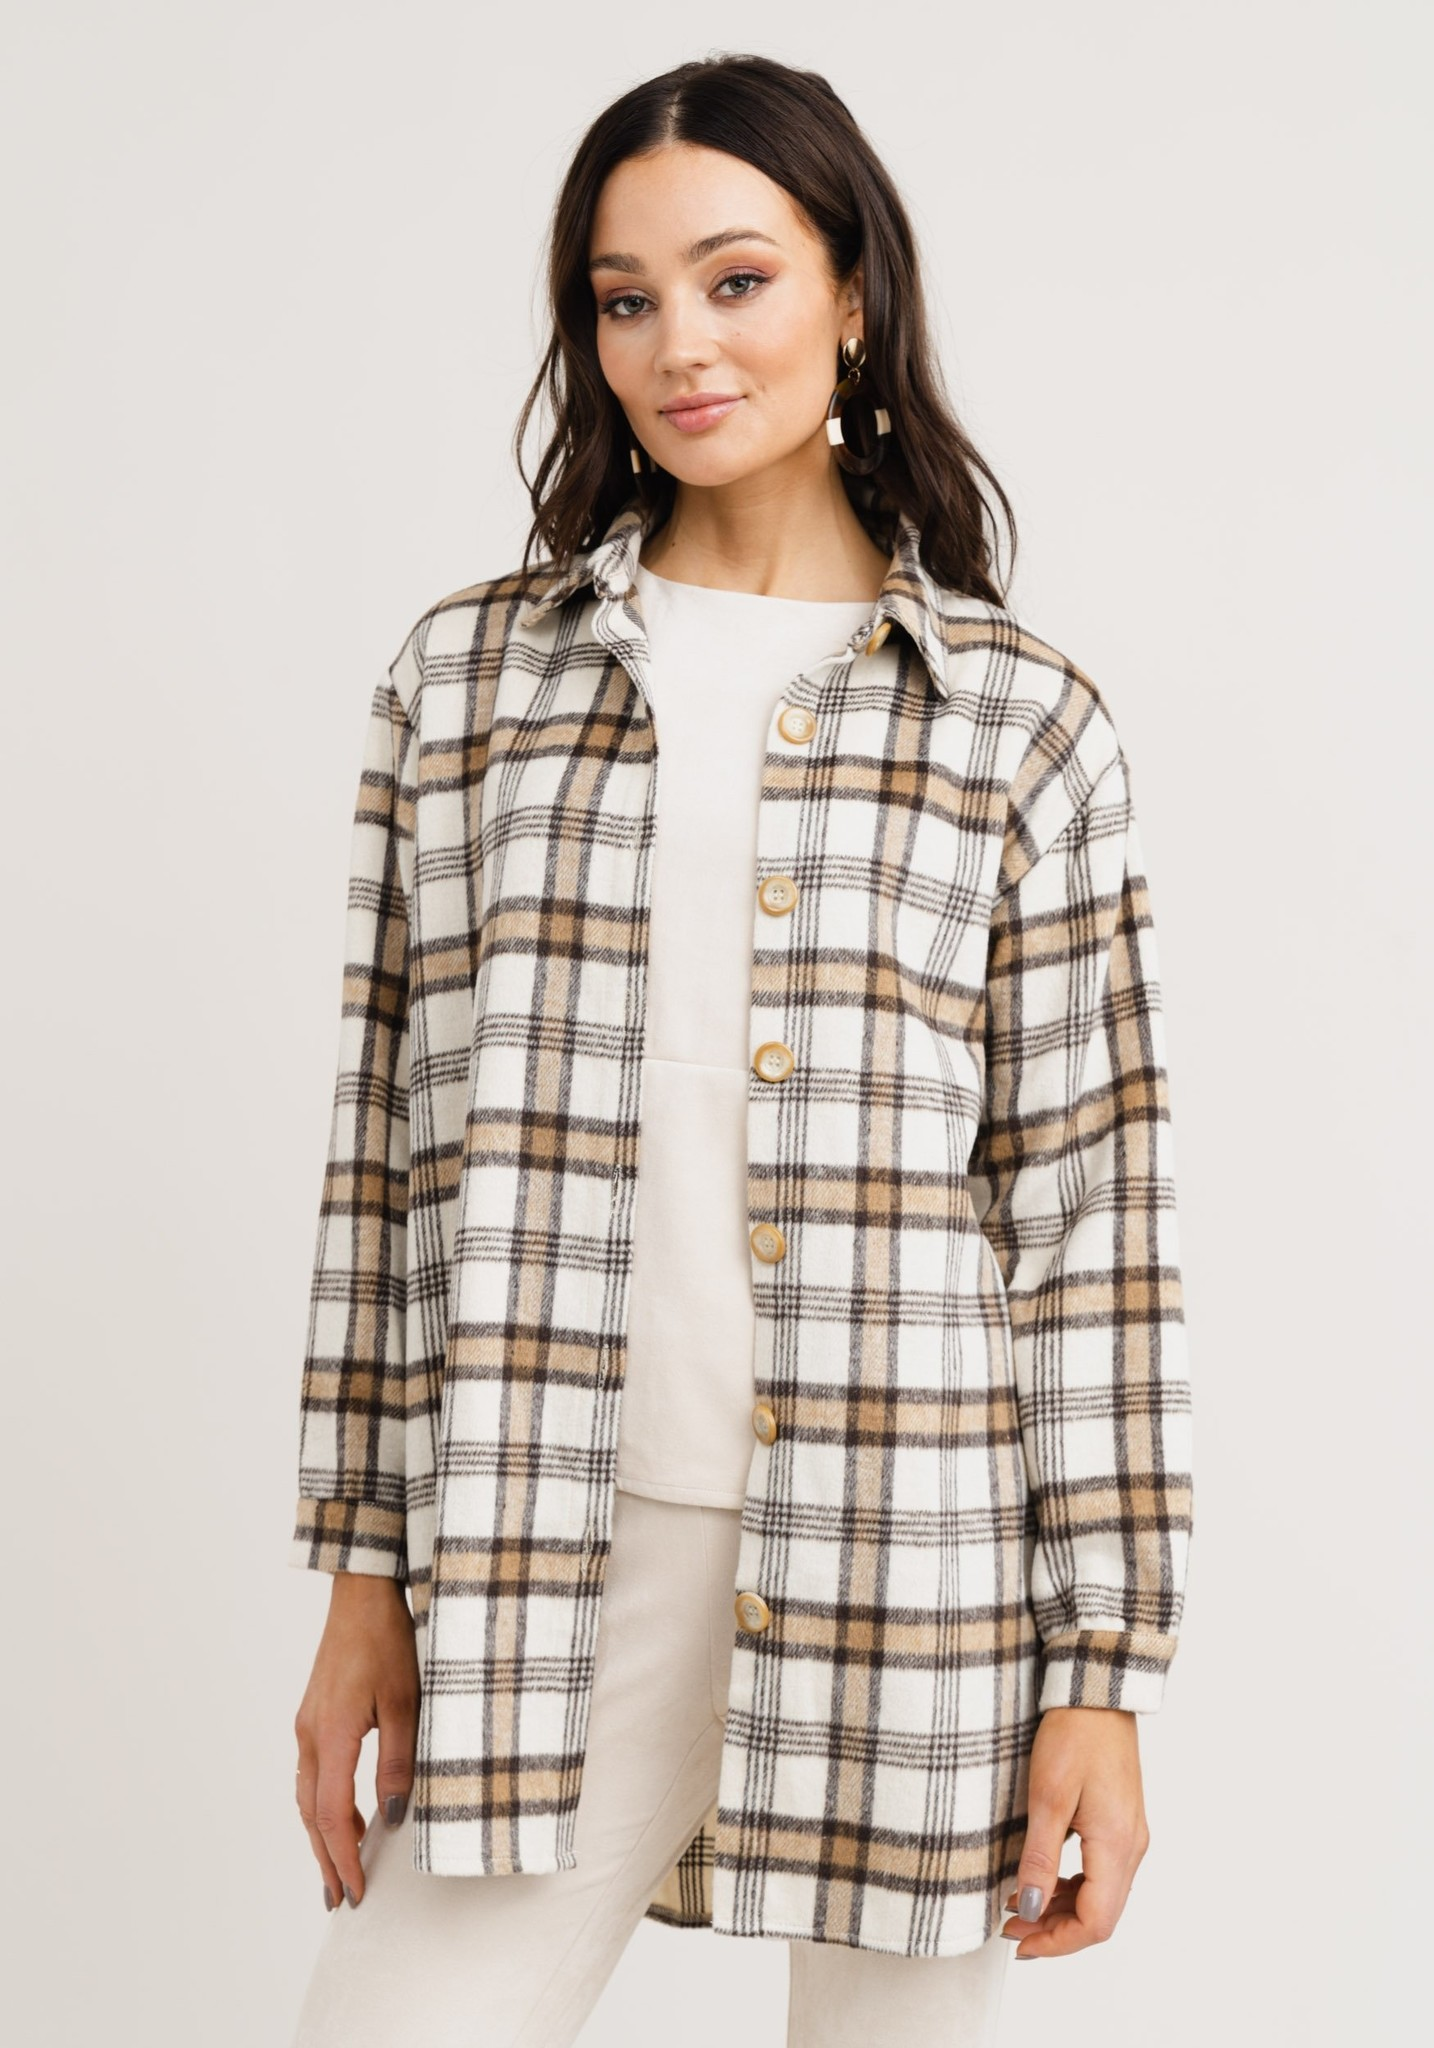 RC Freia Checkered Shirt